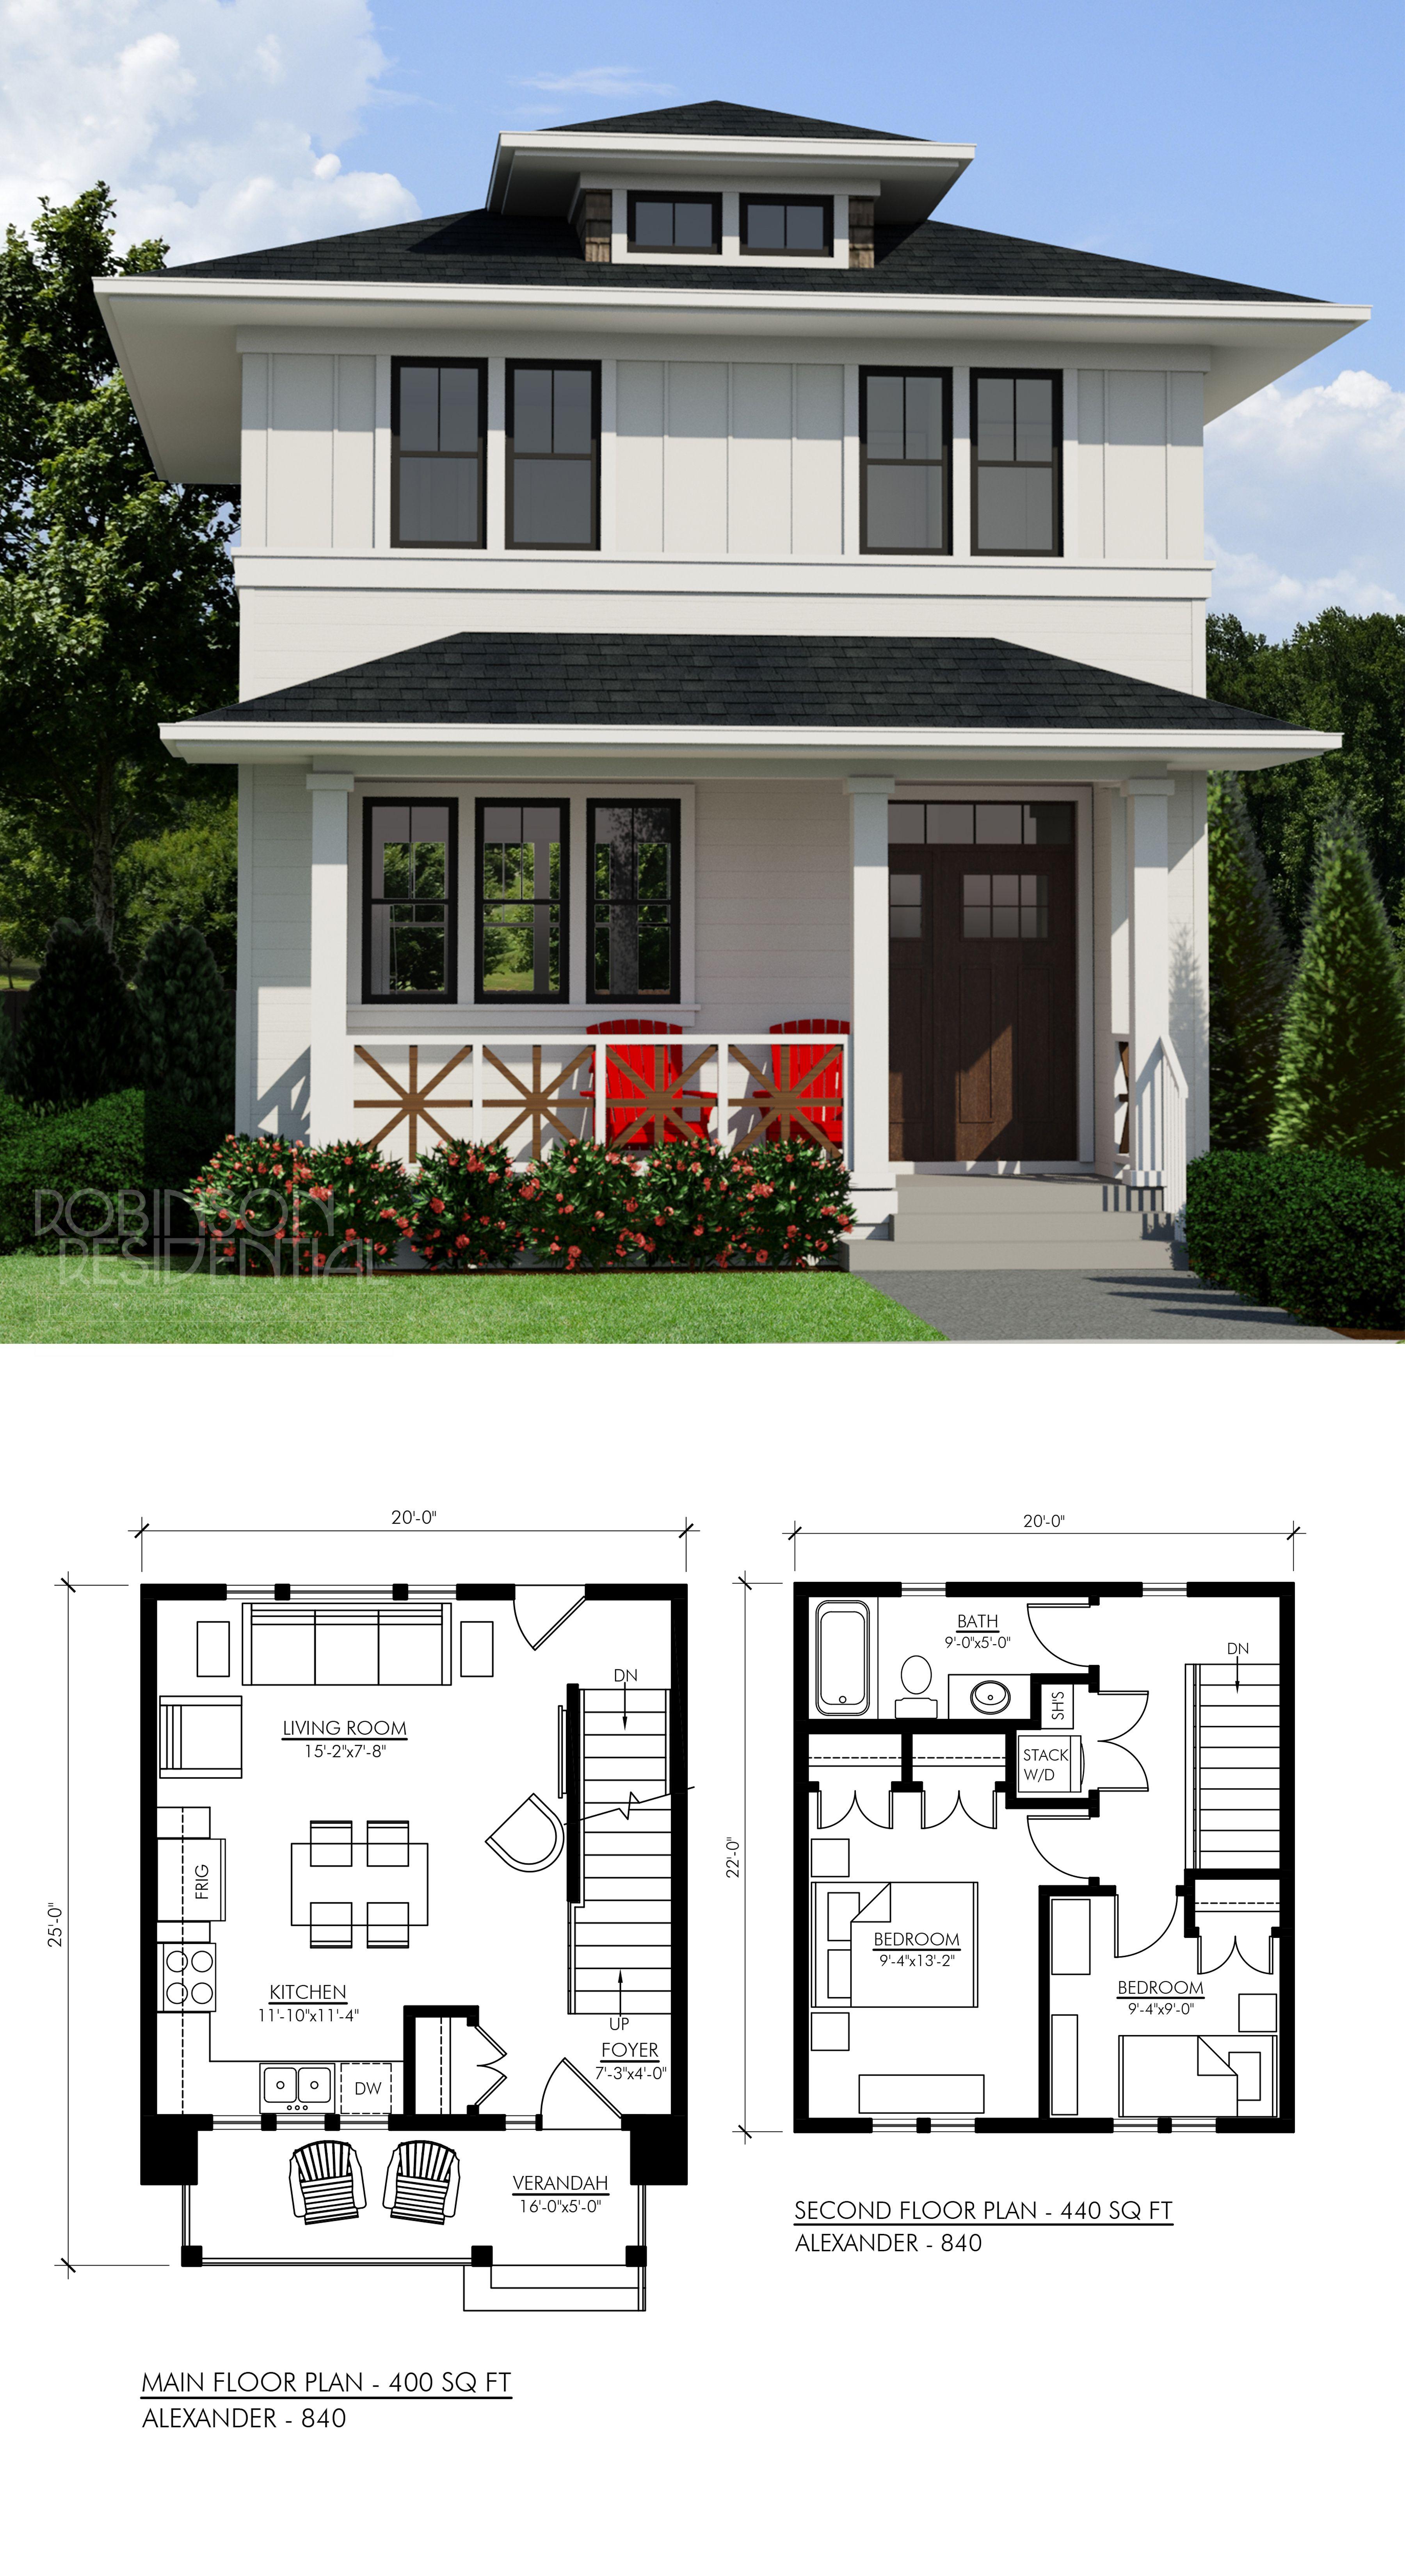 Modern farmhouse alexander also best images small house plans tiny rh pinterest